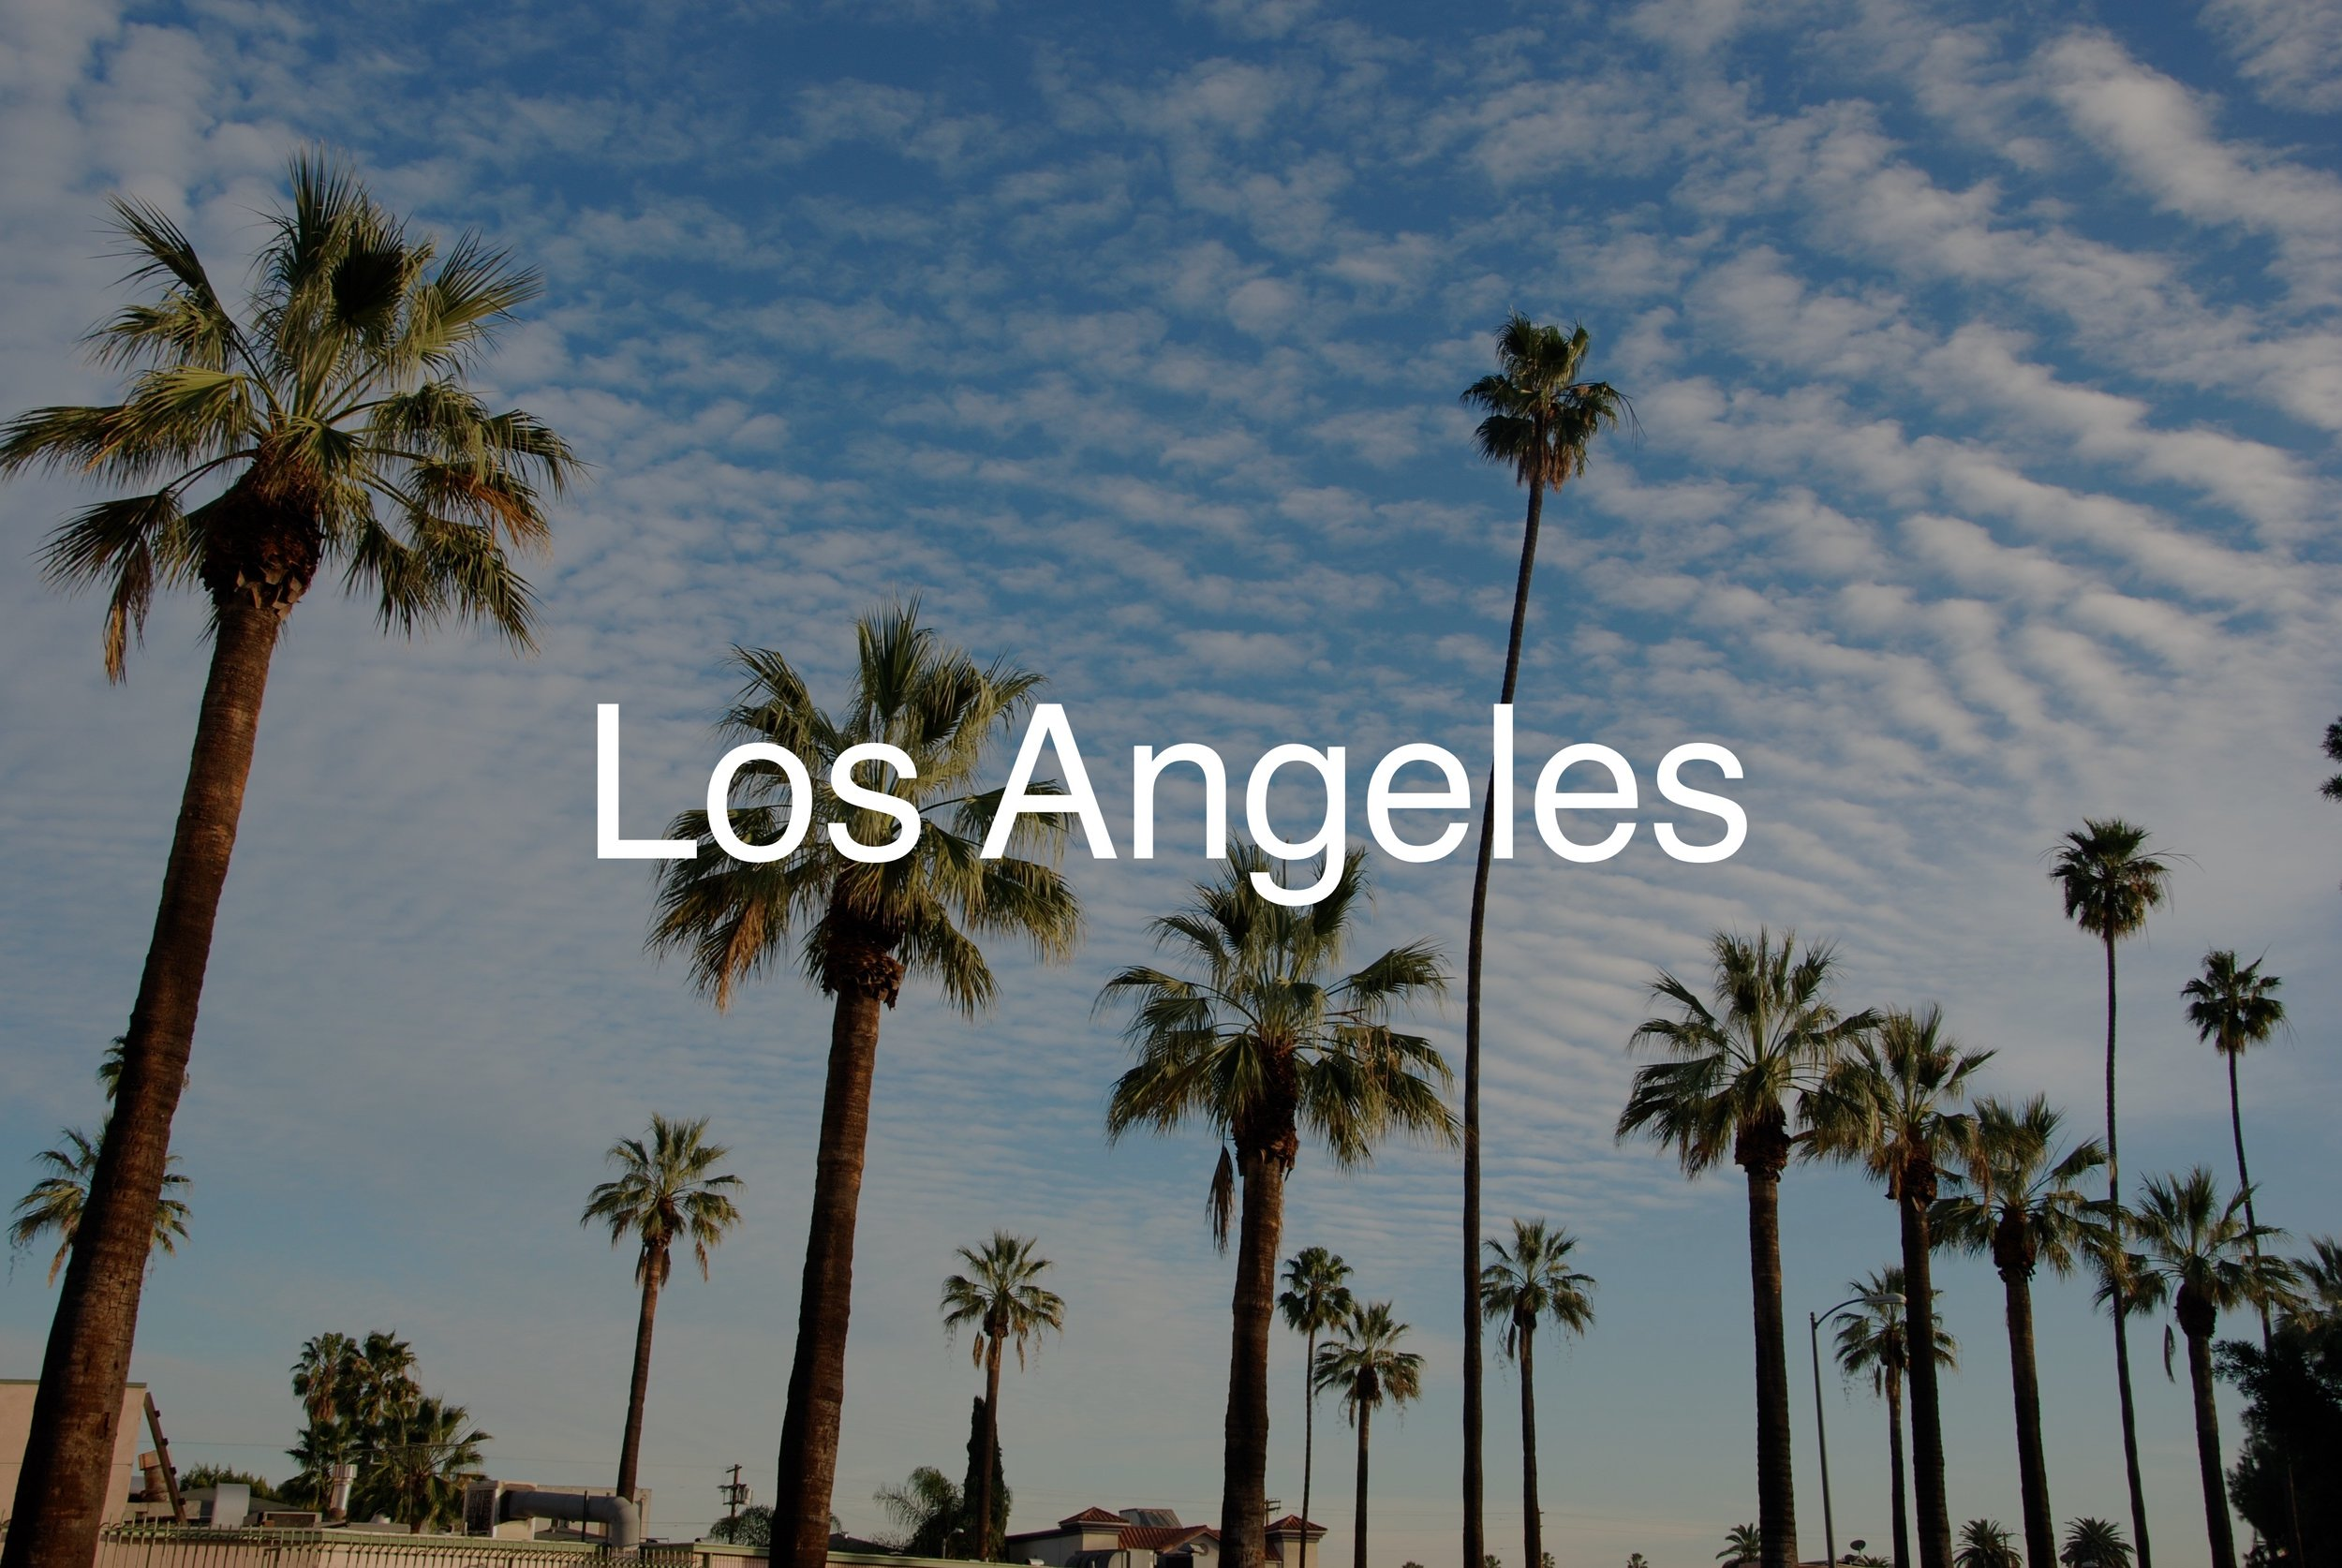 - 9301 Wilshire Blvd, suite 503Beverly HillCA, 90210 USAContact: Carla de Menezes Ribeiro+1 209 643 0102